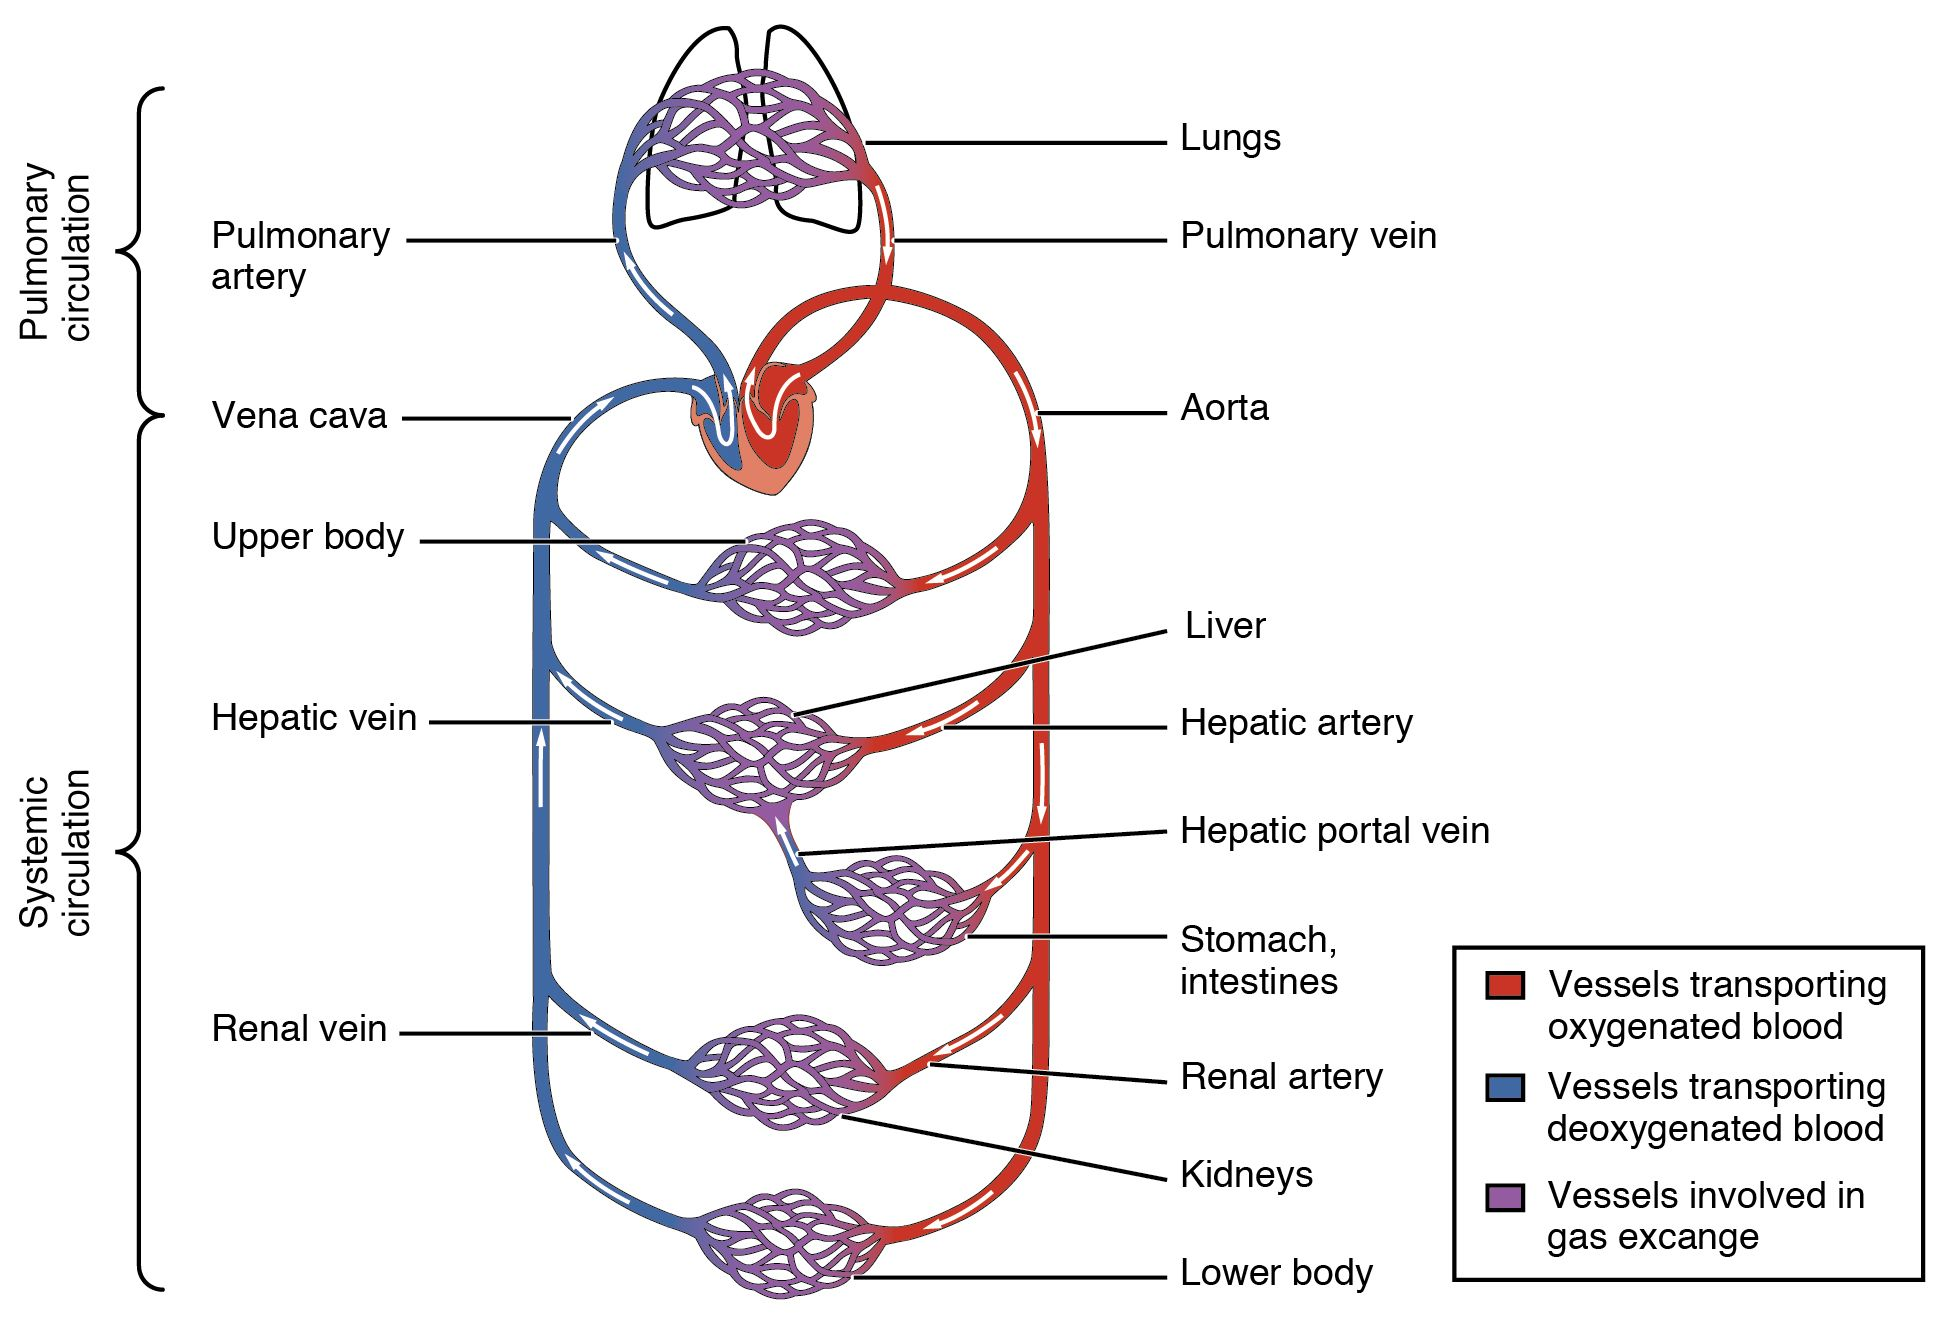 Heart Circulatory System 2101 Blood Flow Through The Heartg